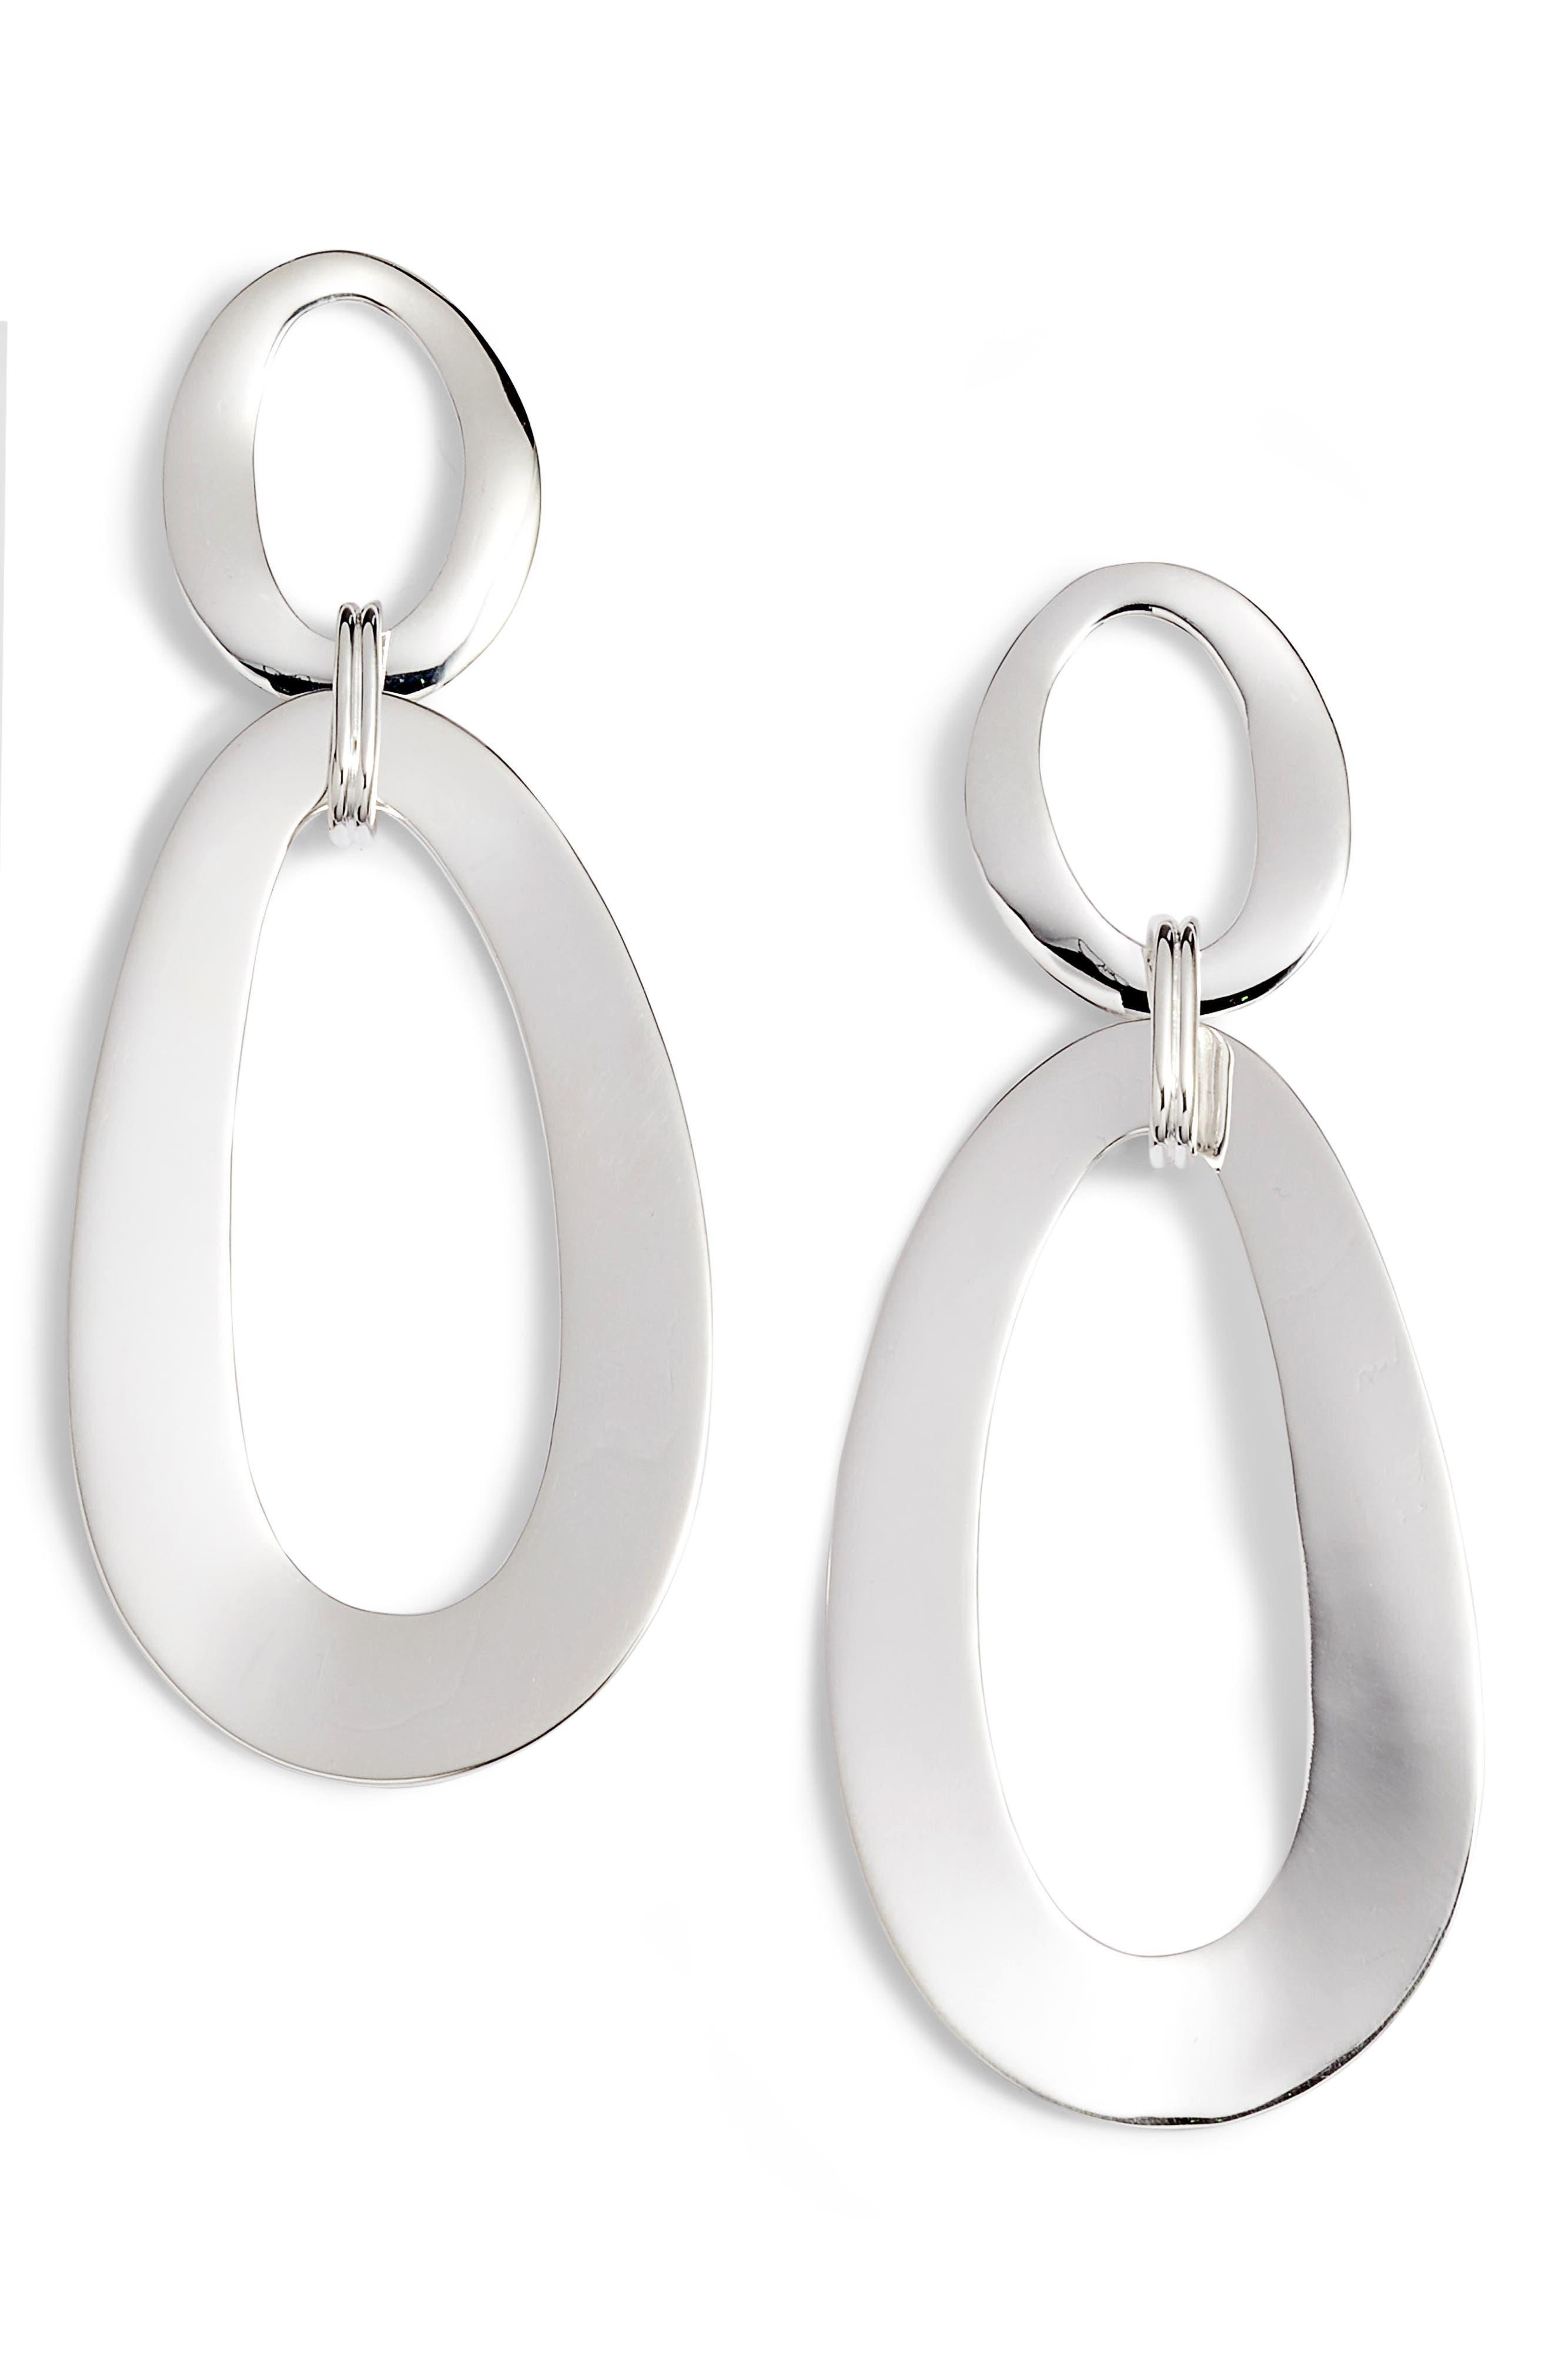 Cherish Extra Large Snowman Earrings,                         Main,                         color, 040